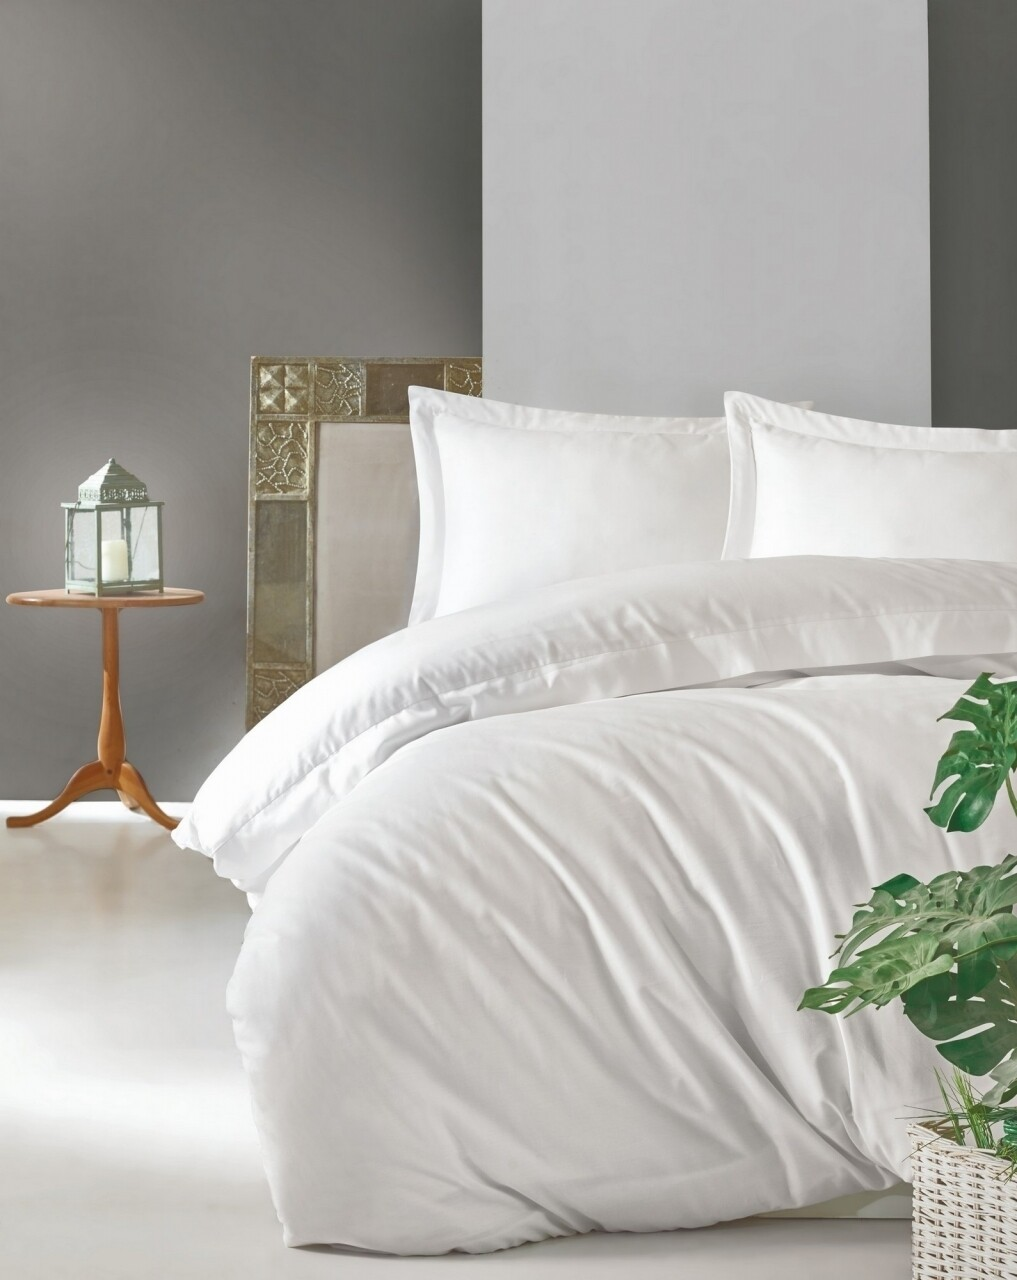 Lenjerie de pat dubla, 4 piese, 100% bumbac satinat, Cotton Box, Premium Elegant, alb